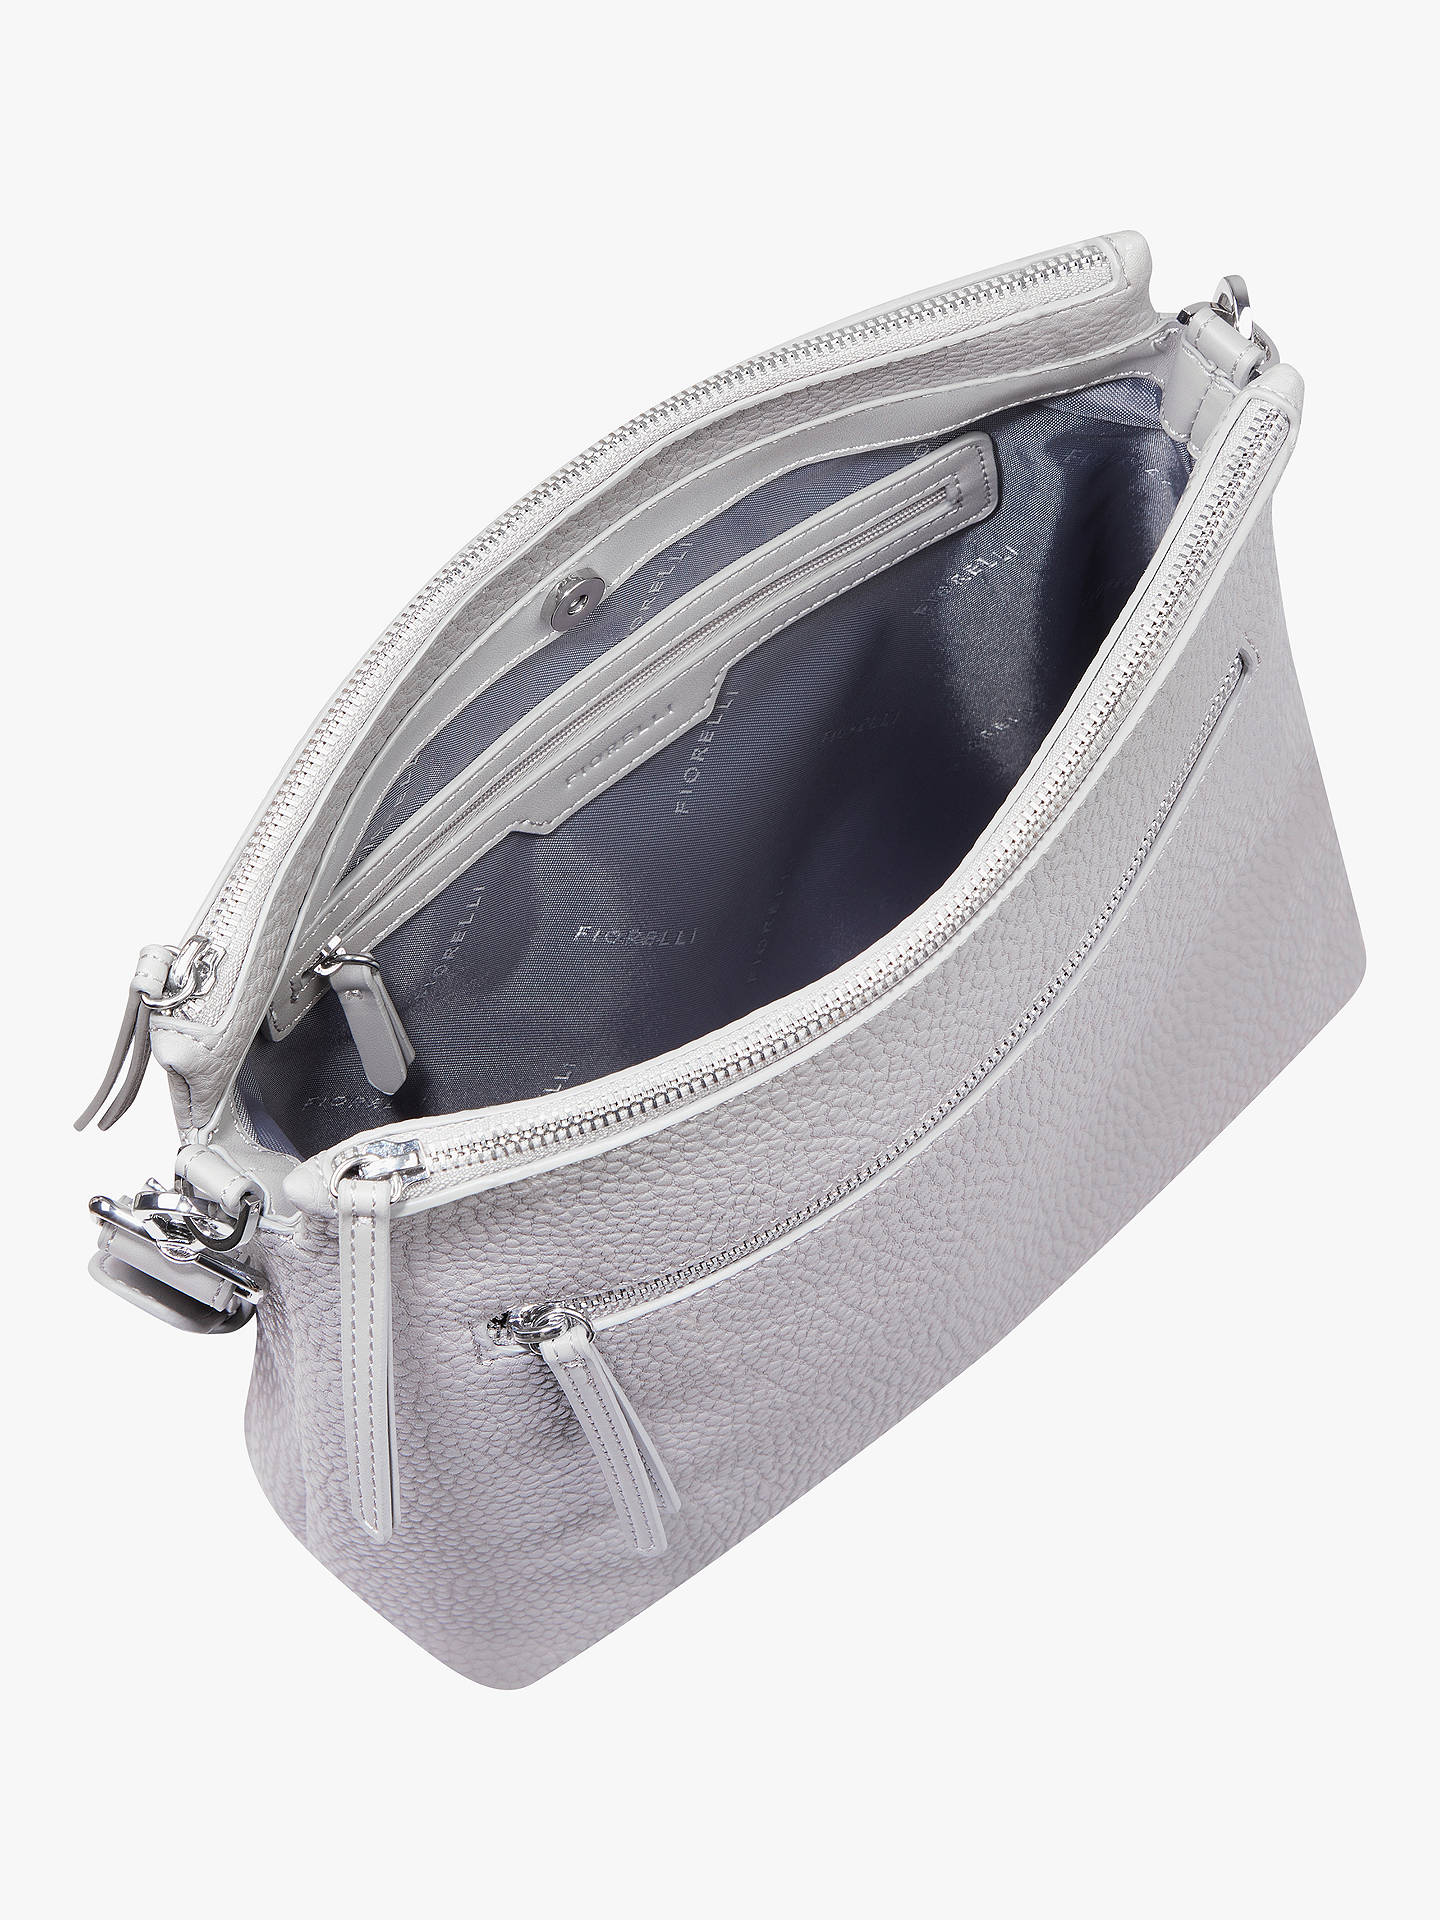 9fa1aac2eb9 ... Buy Fiorelli Elliot Cross Body Satchel Bag, Steel Online at  johnlewis.com ...